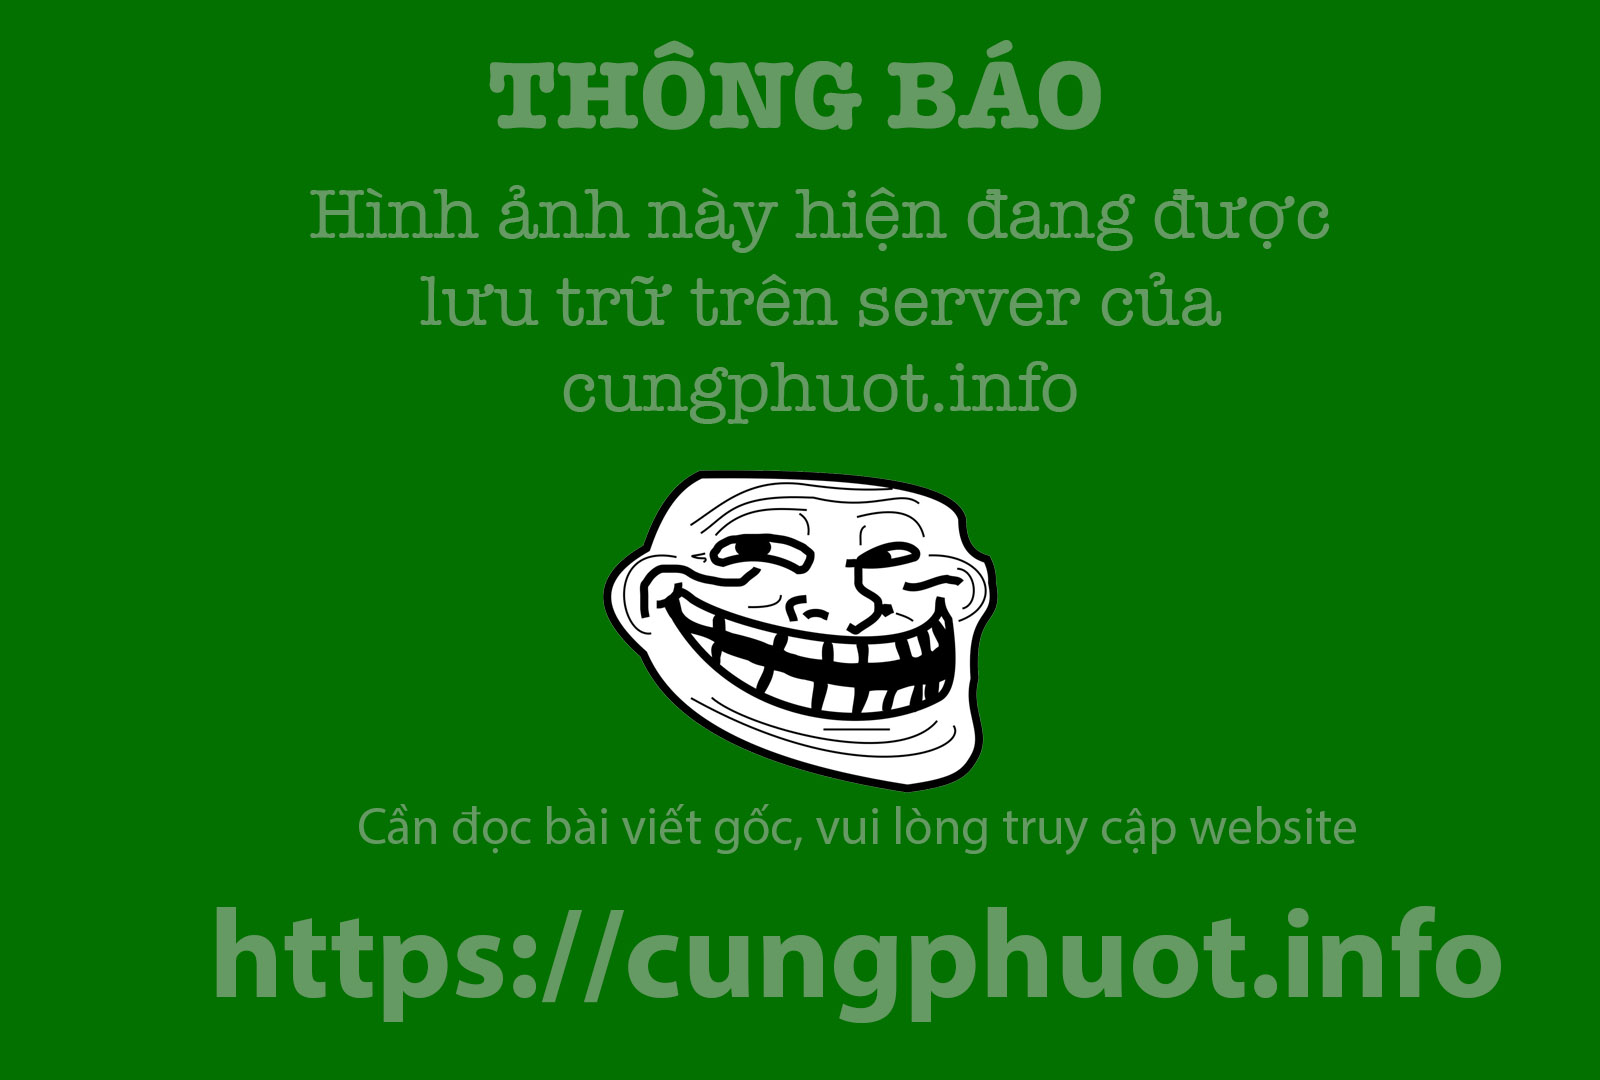 Ảnh: @ducanhnguyenn